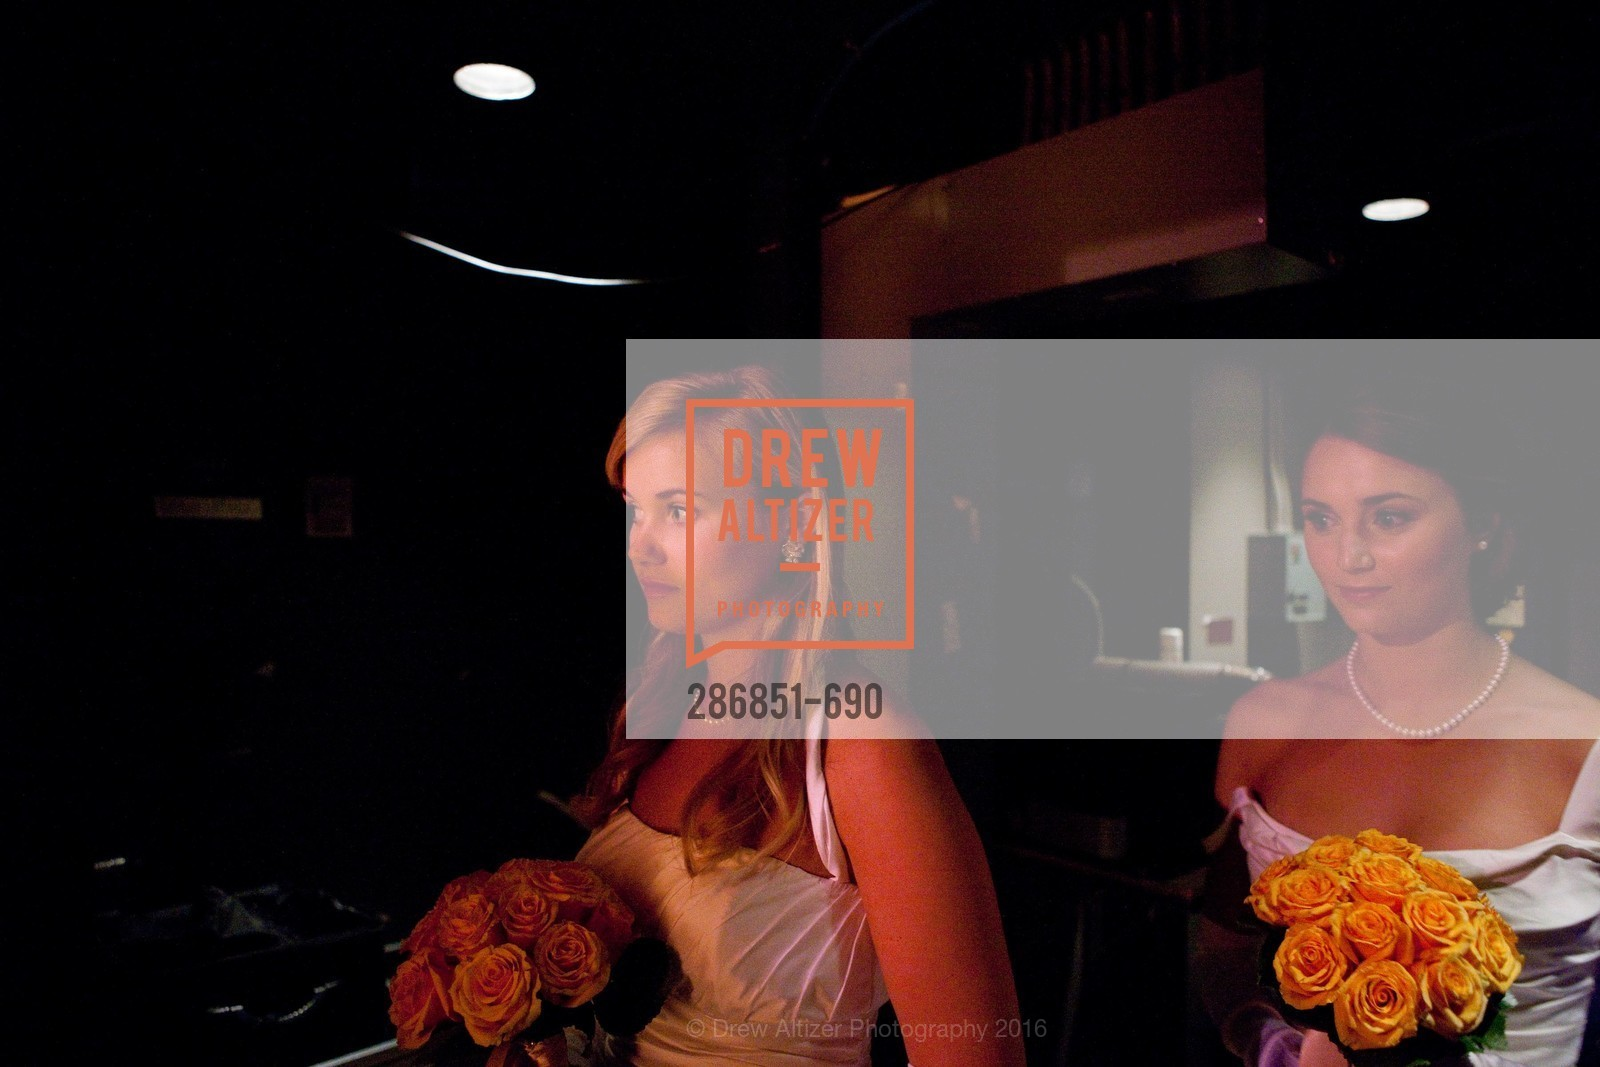 Emma Giorgianna Jesberg, Anne Christine Lewis, 2009 Debutante Ball, Unknown, July 4th, 2008,Drew Altizer, Drew Altizer Photography, full-service agency, private events, San Francisco photographer, photographer california